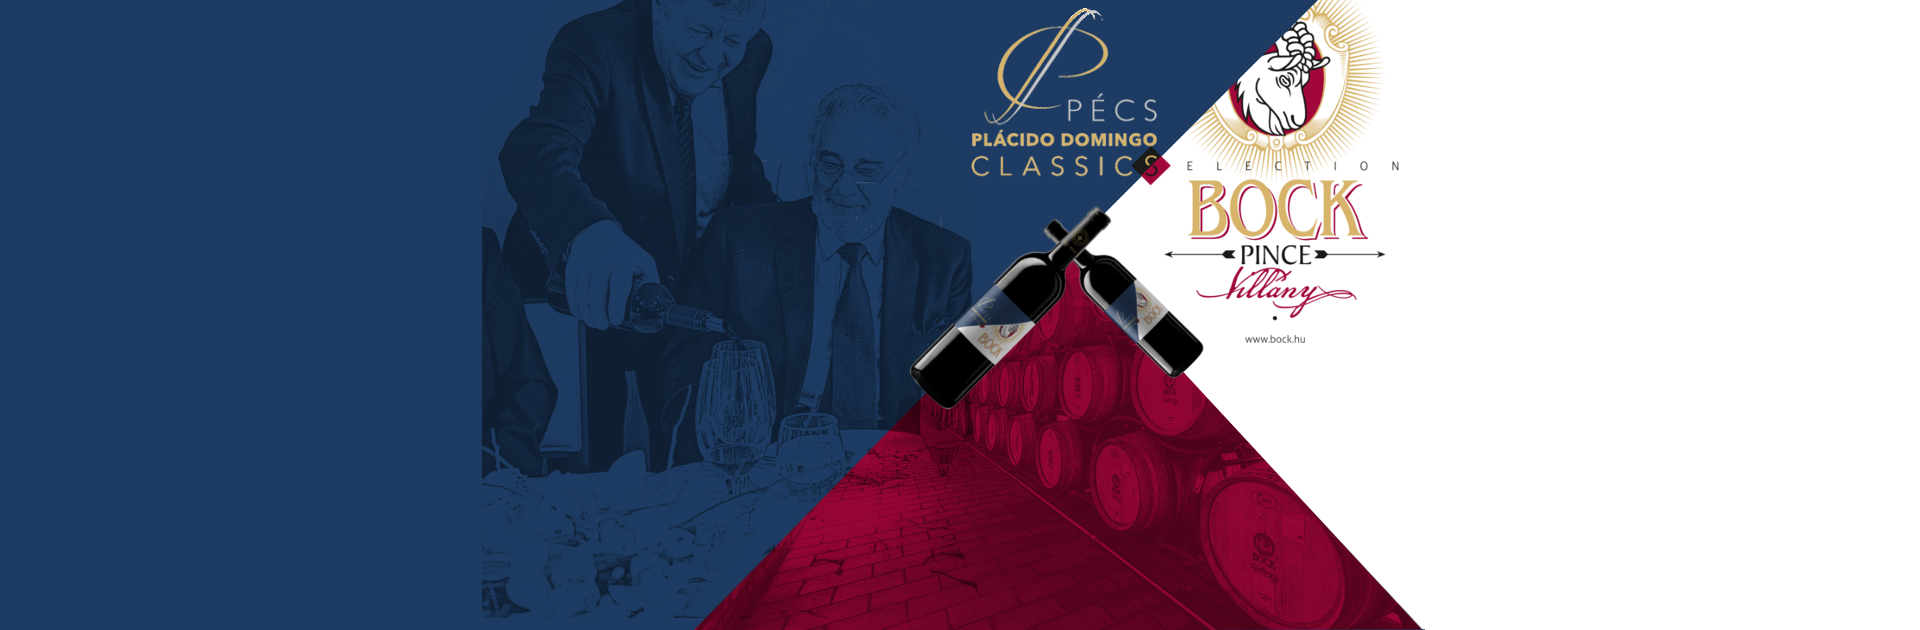 Bock Placido Domingo Selection